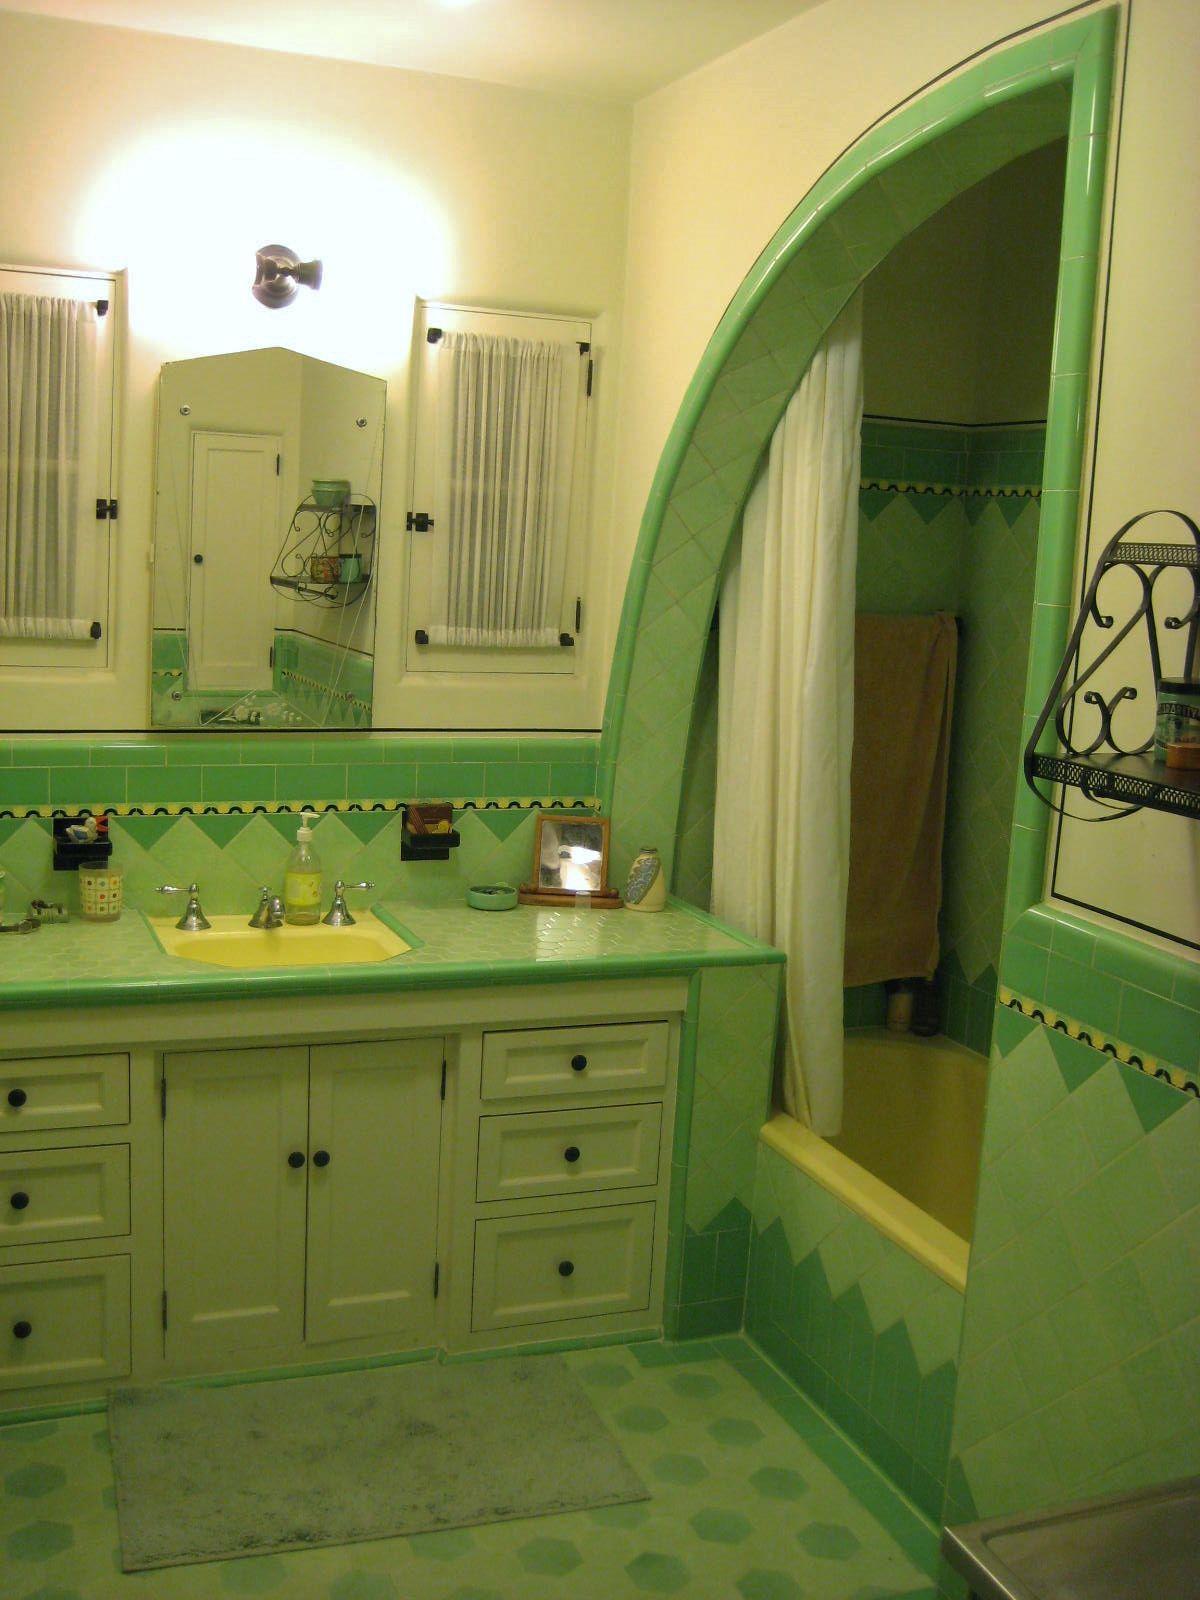 483 Wonderful Original Architectural Details From Reader